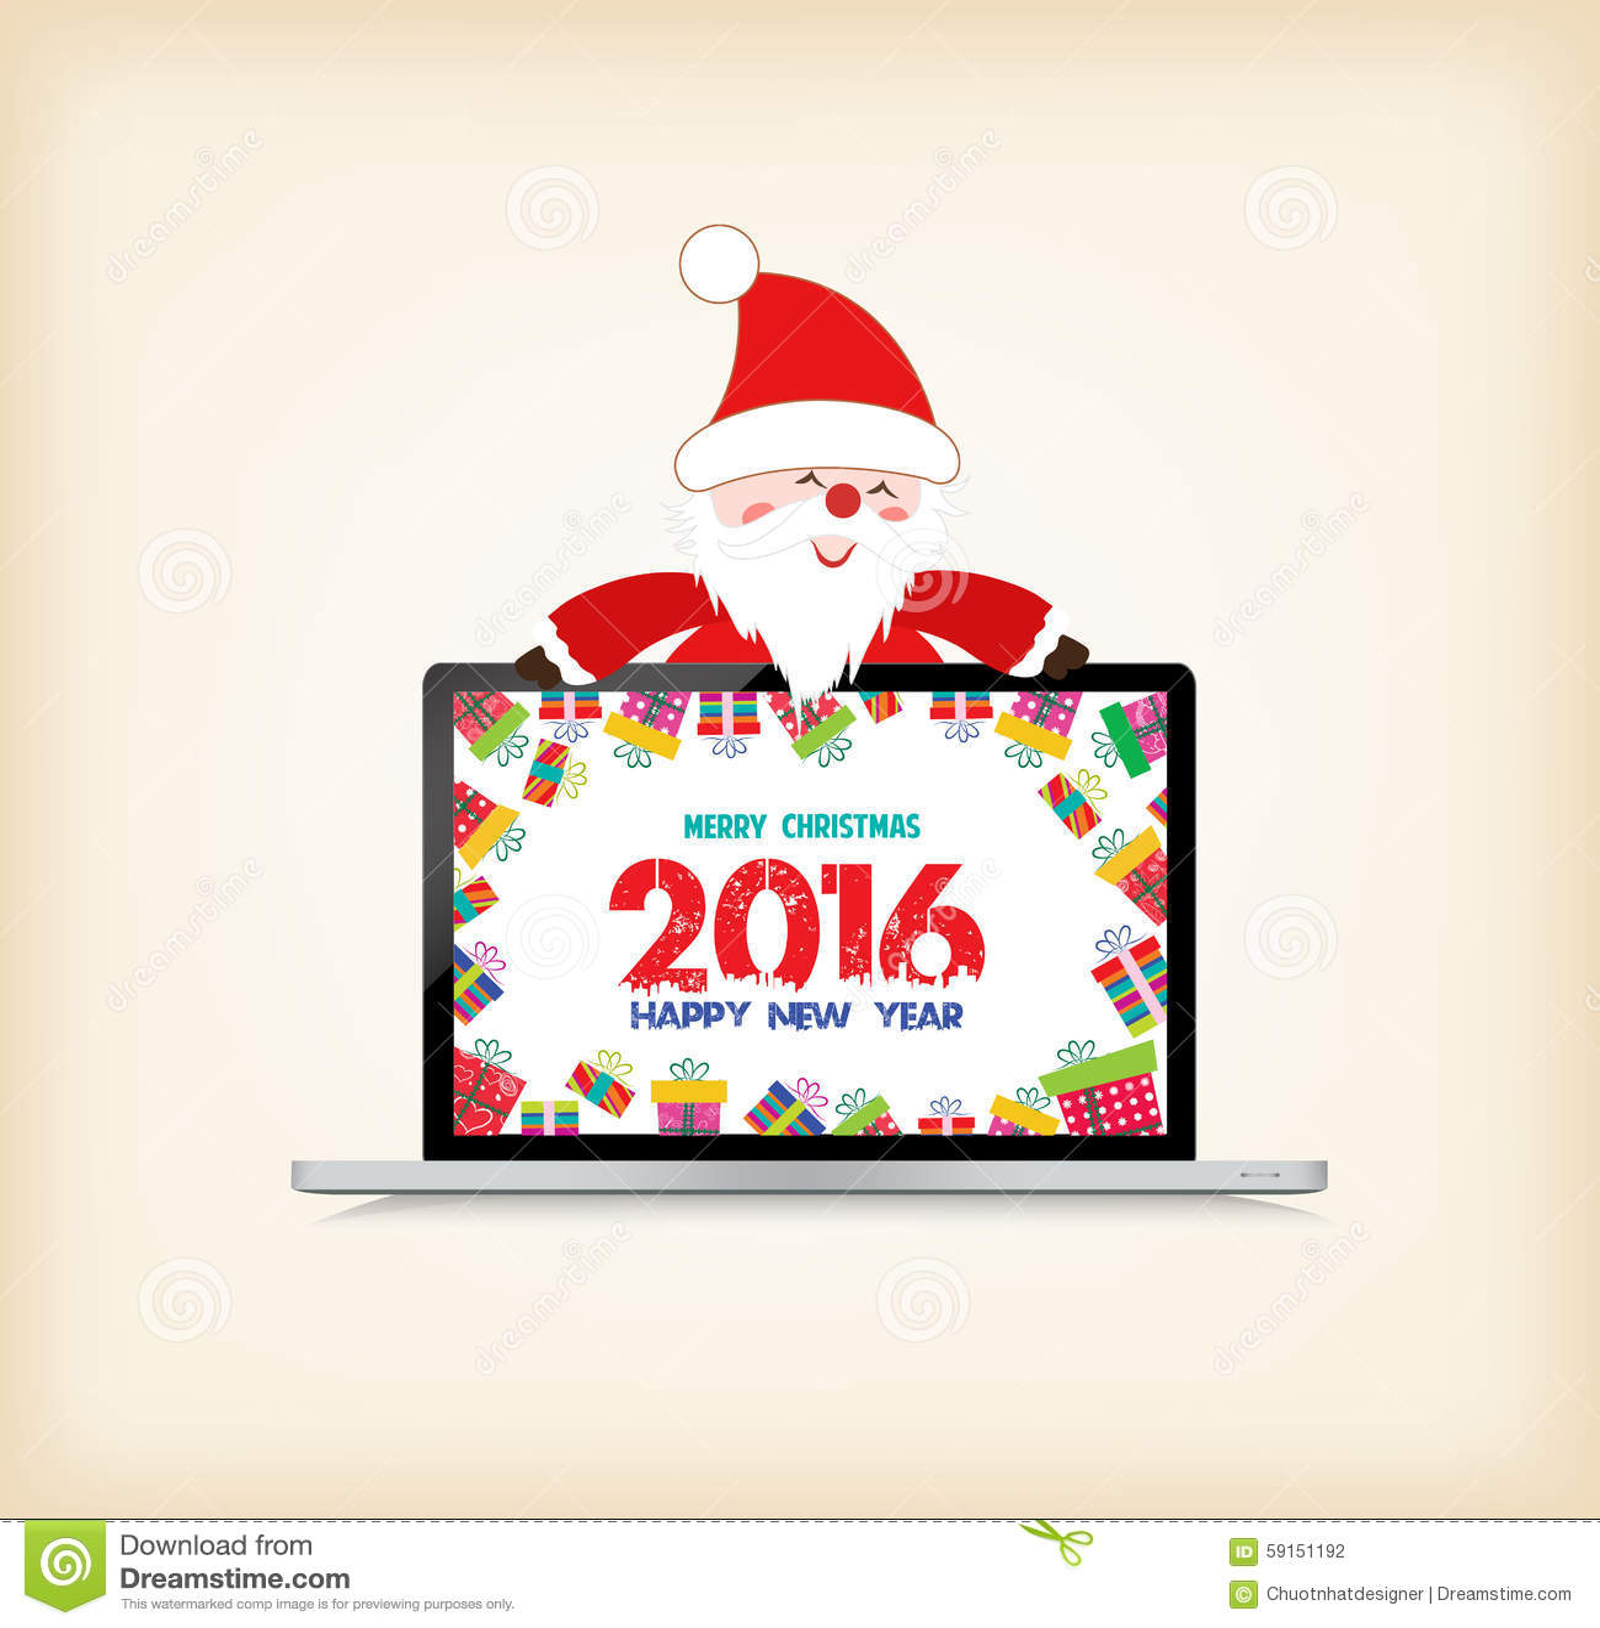 bonne ann e 2016 no l avec le p re no l et cadeau sur l 39 ordinateur portable illustration de. Black Bedroom Furniture Sets. Home Design Ideas